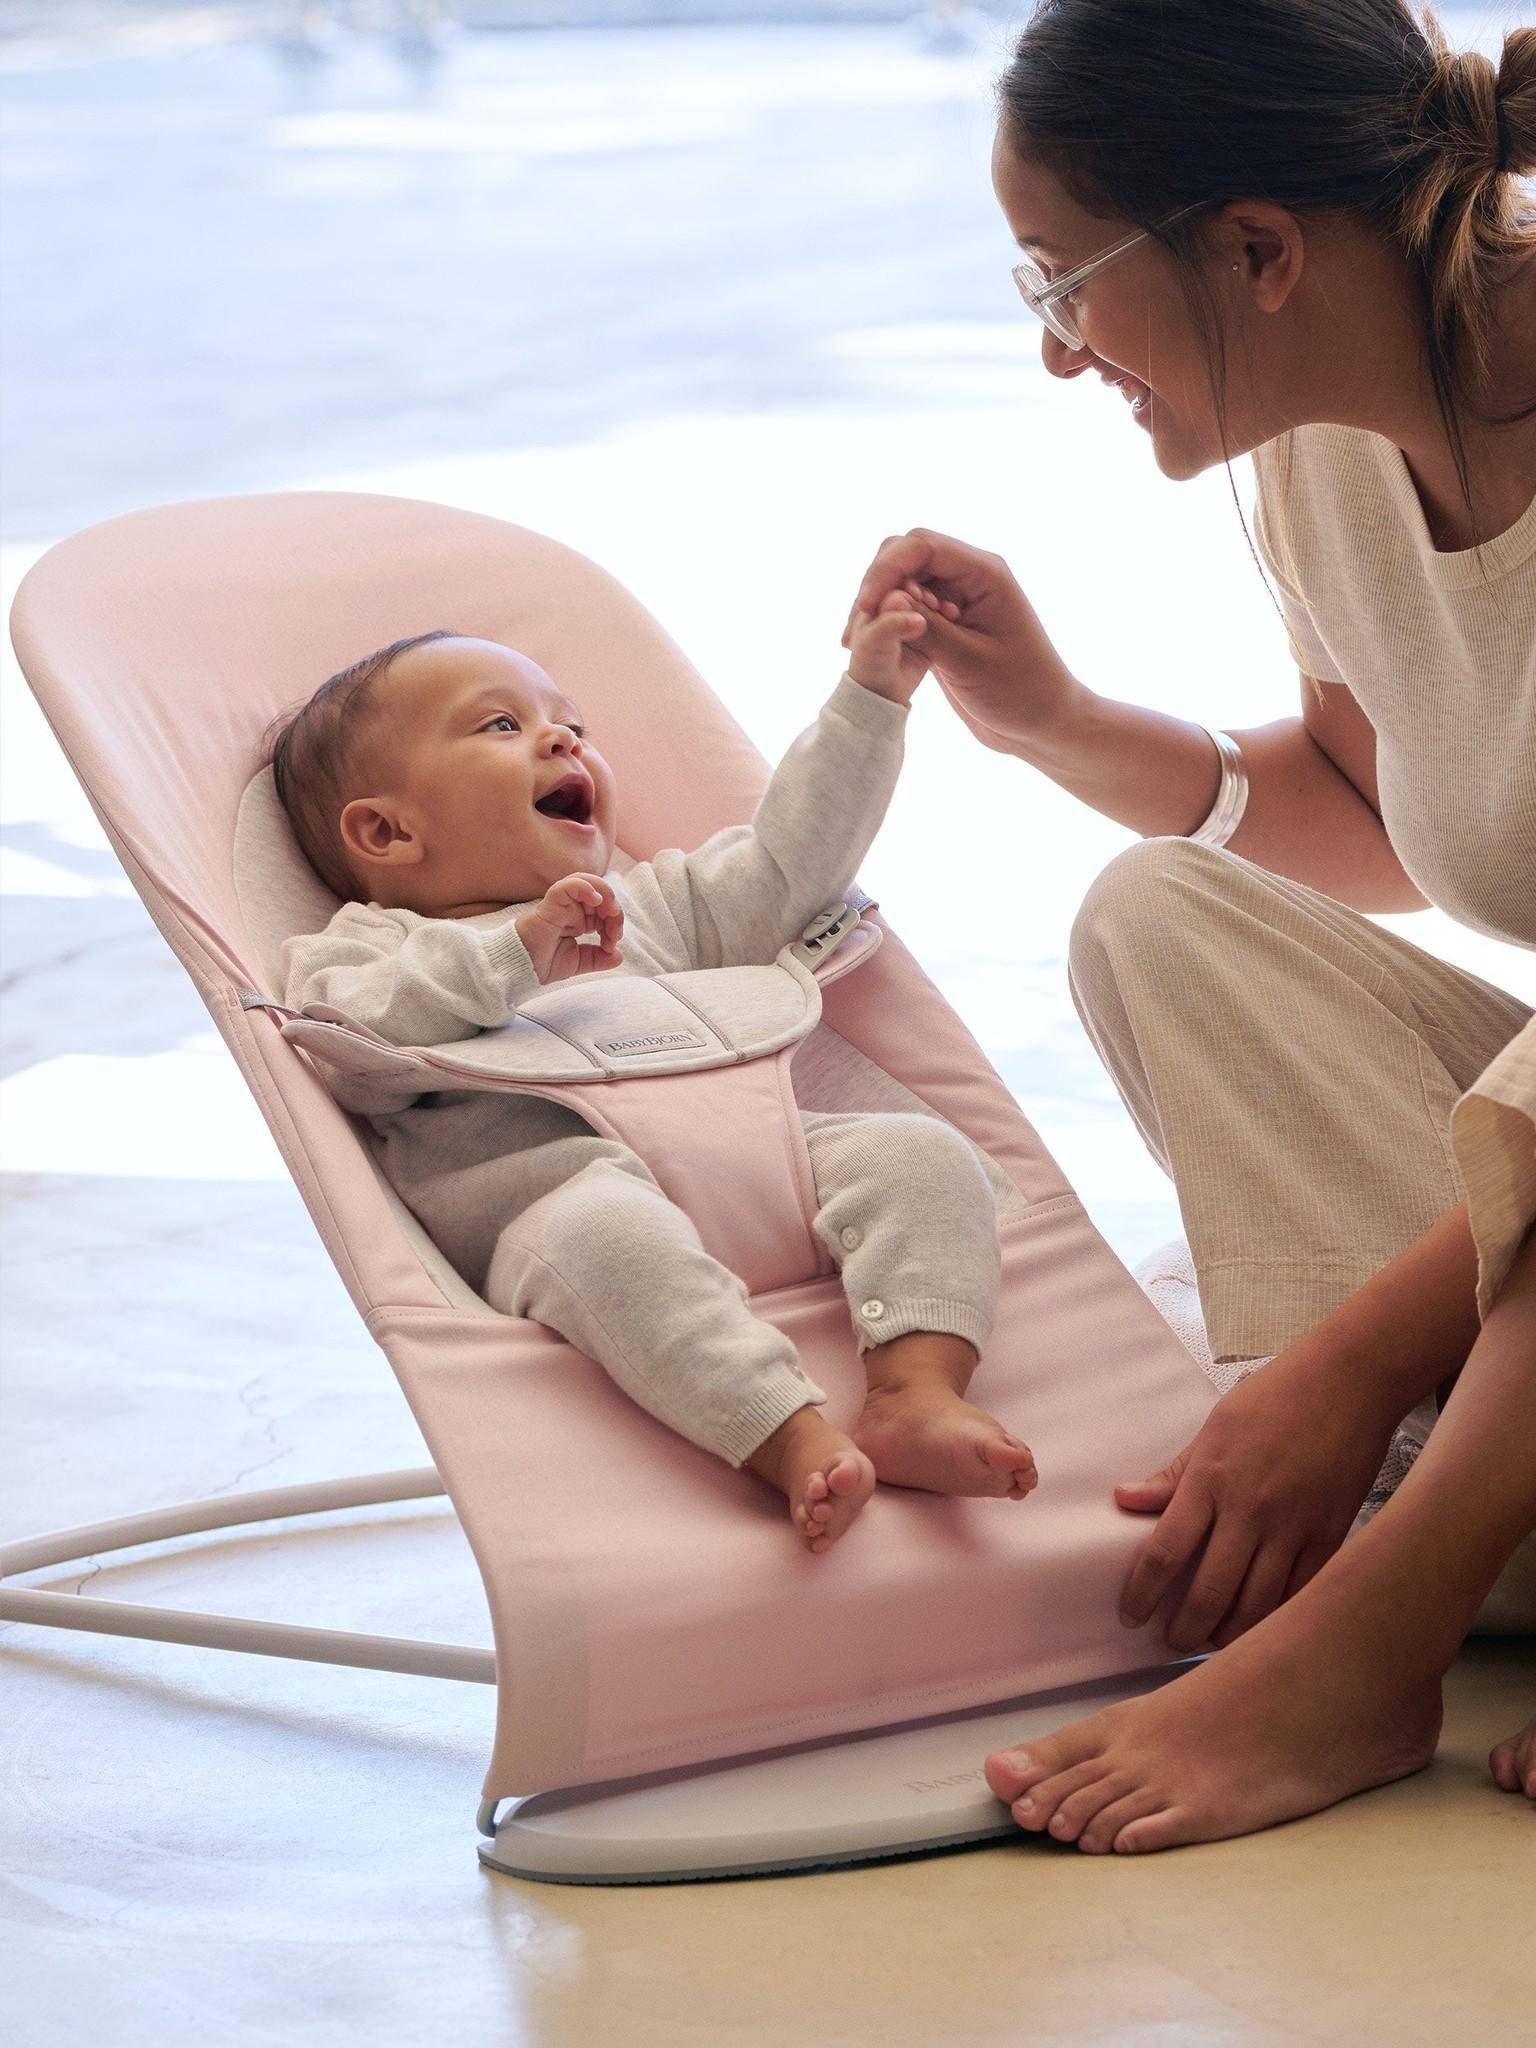 BABYBJÖRN BABYBJÖRN Wipstoeltje Balance Soft Lichtgrijs frame Lichtroze-Grijs Cotton Jersey